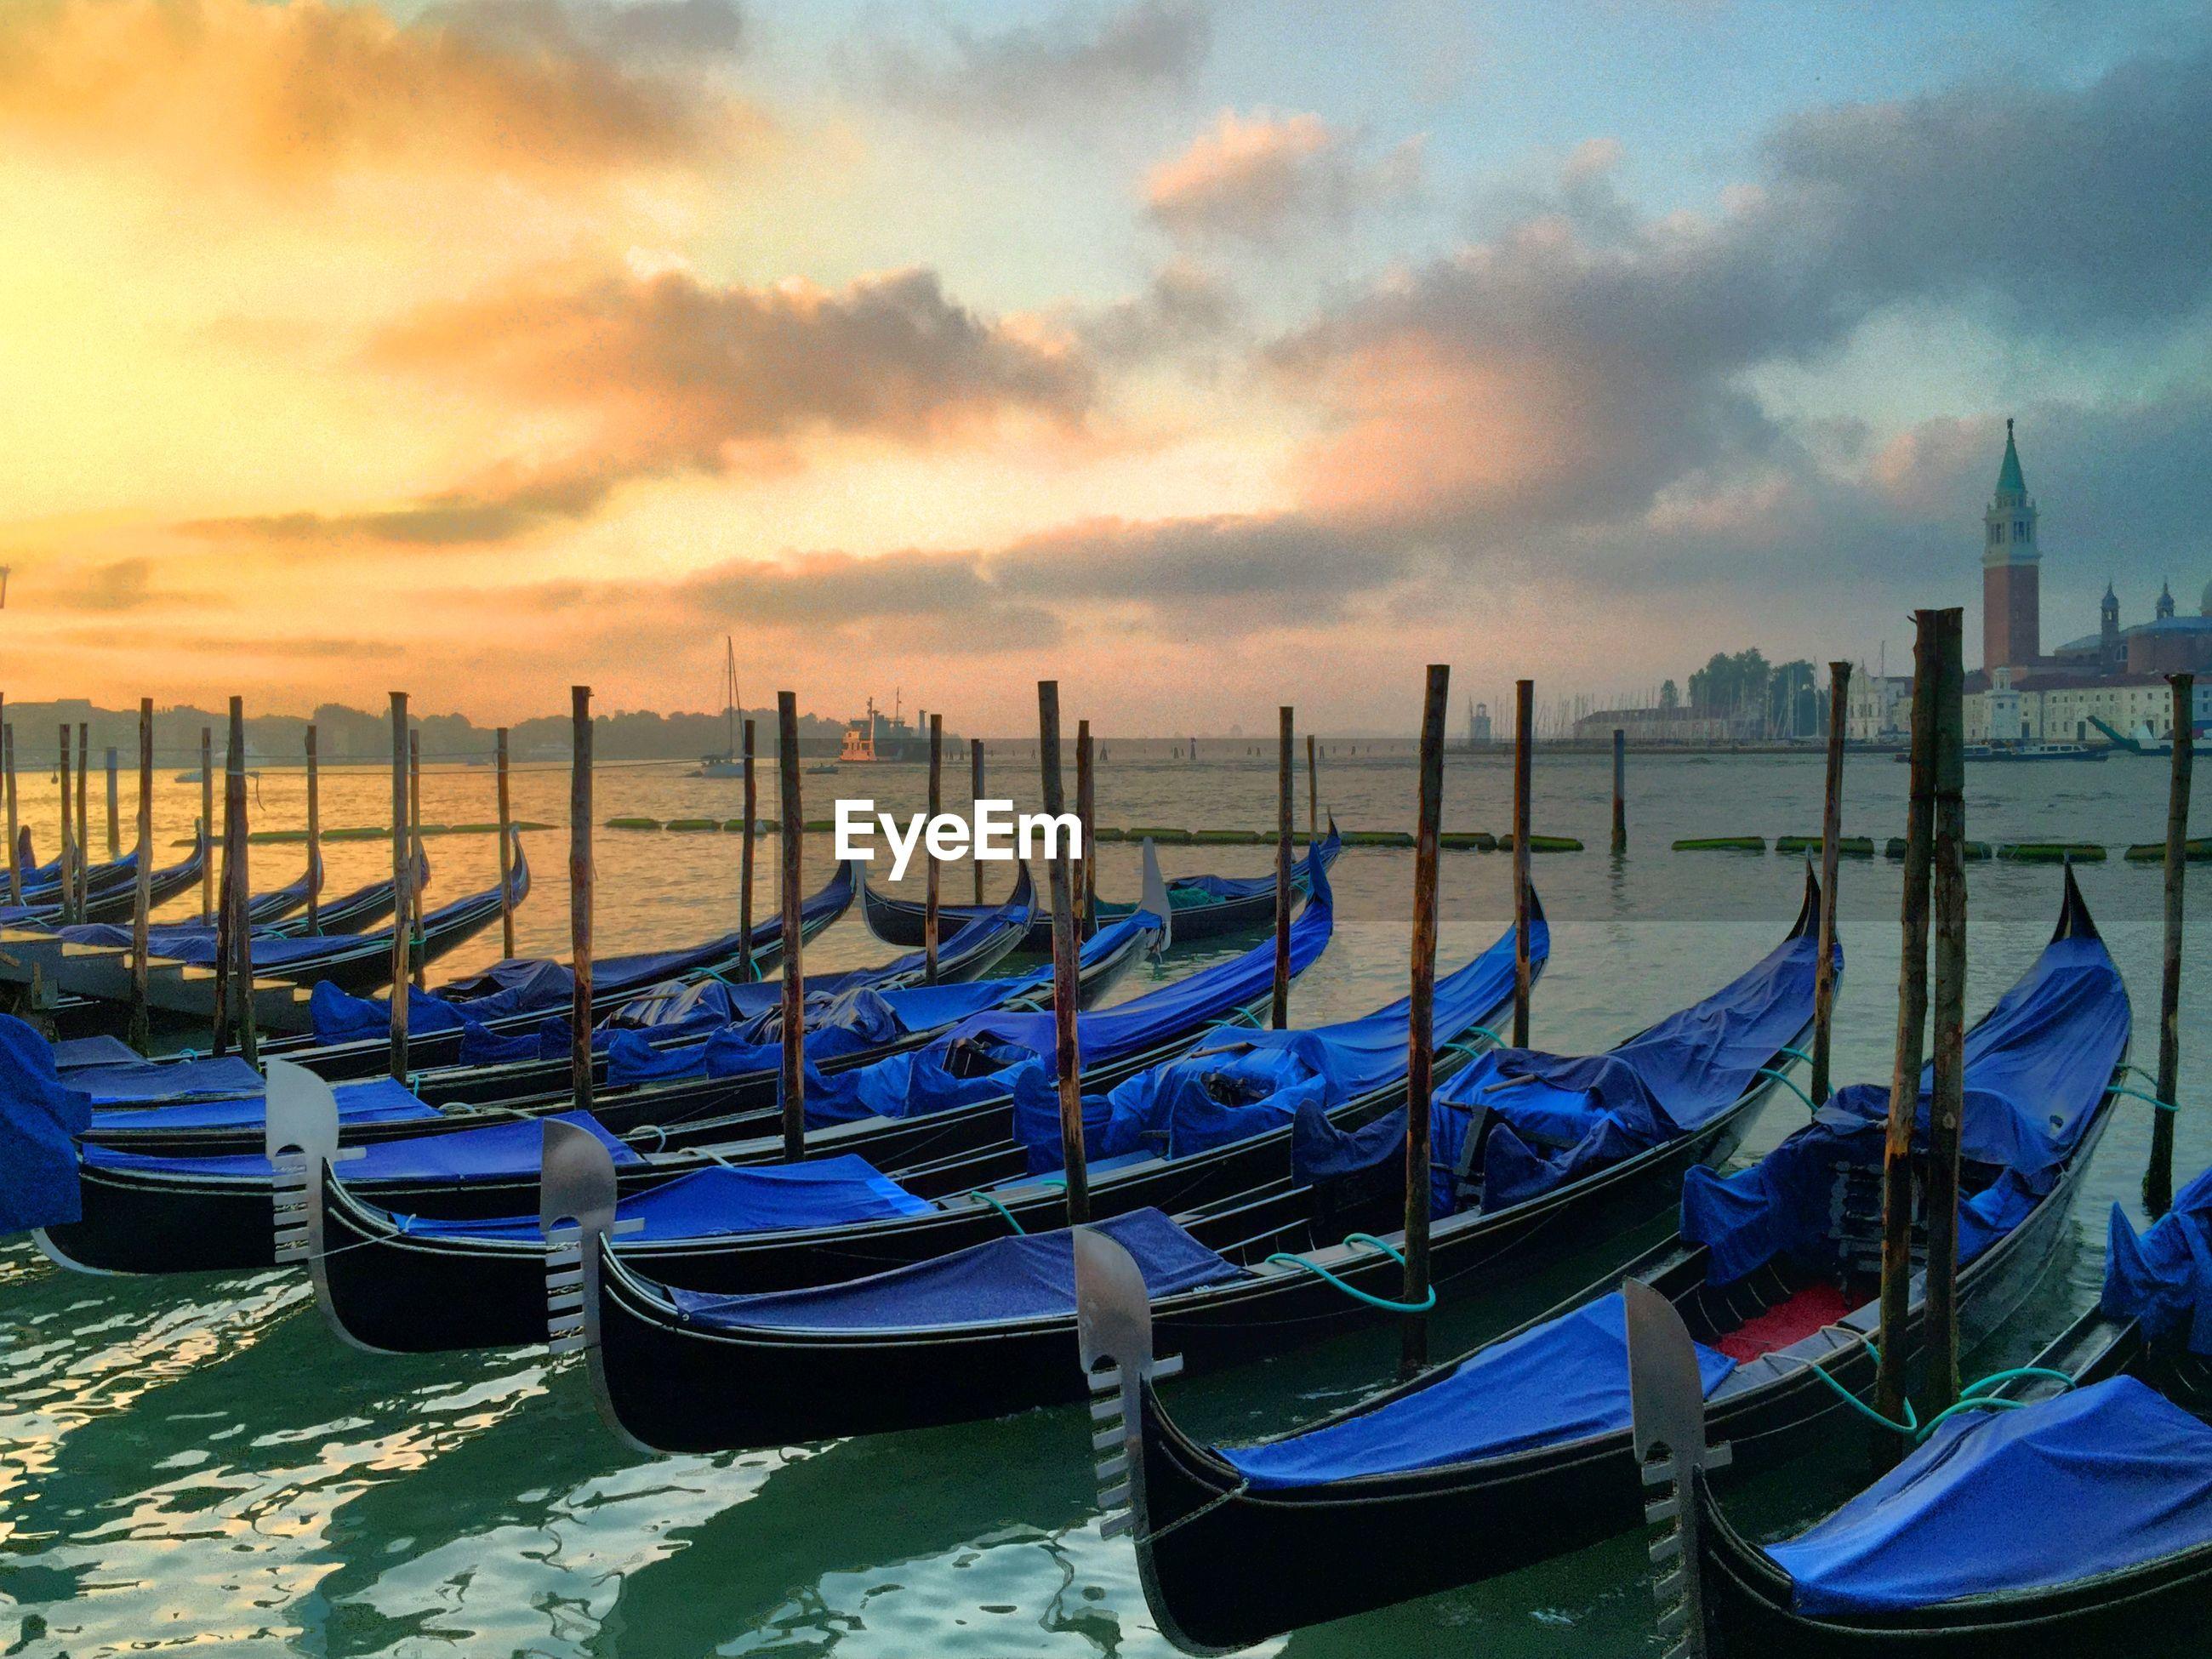 Gondolas moored in lake against sky during sunrise